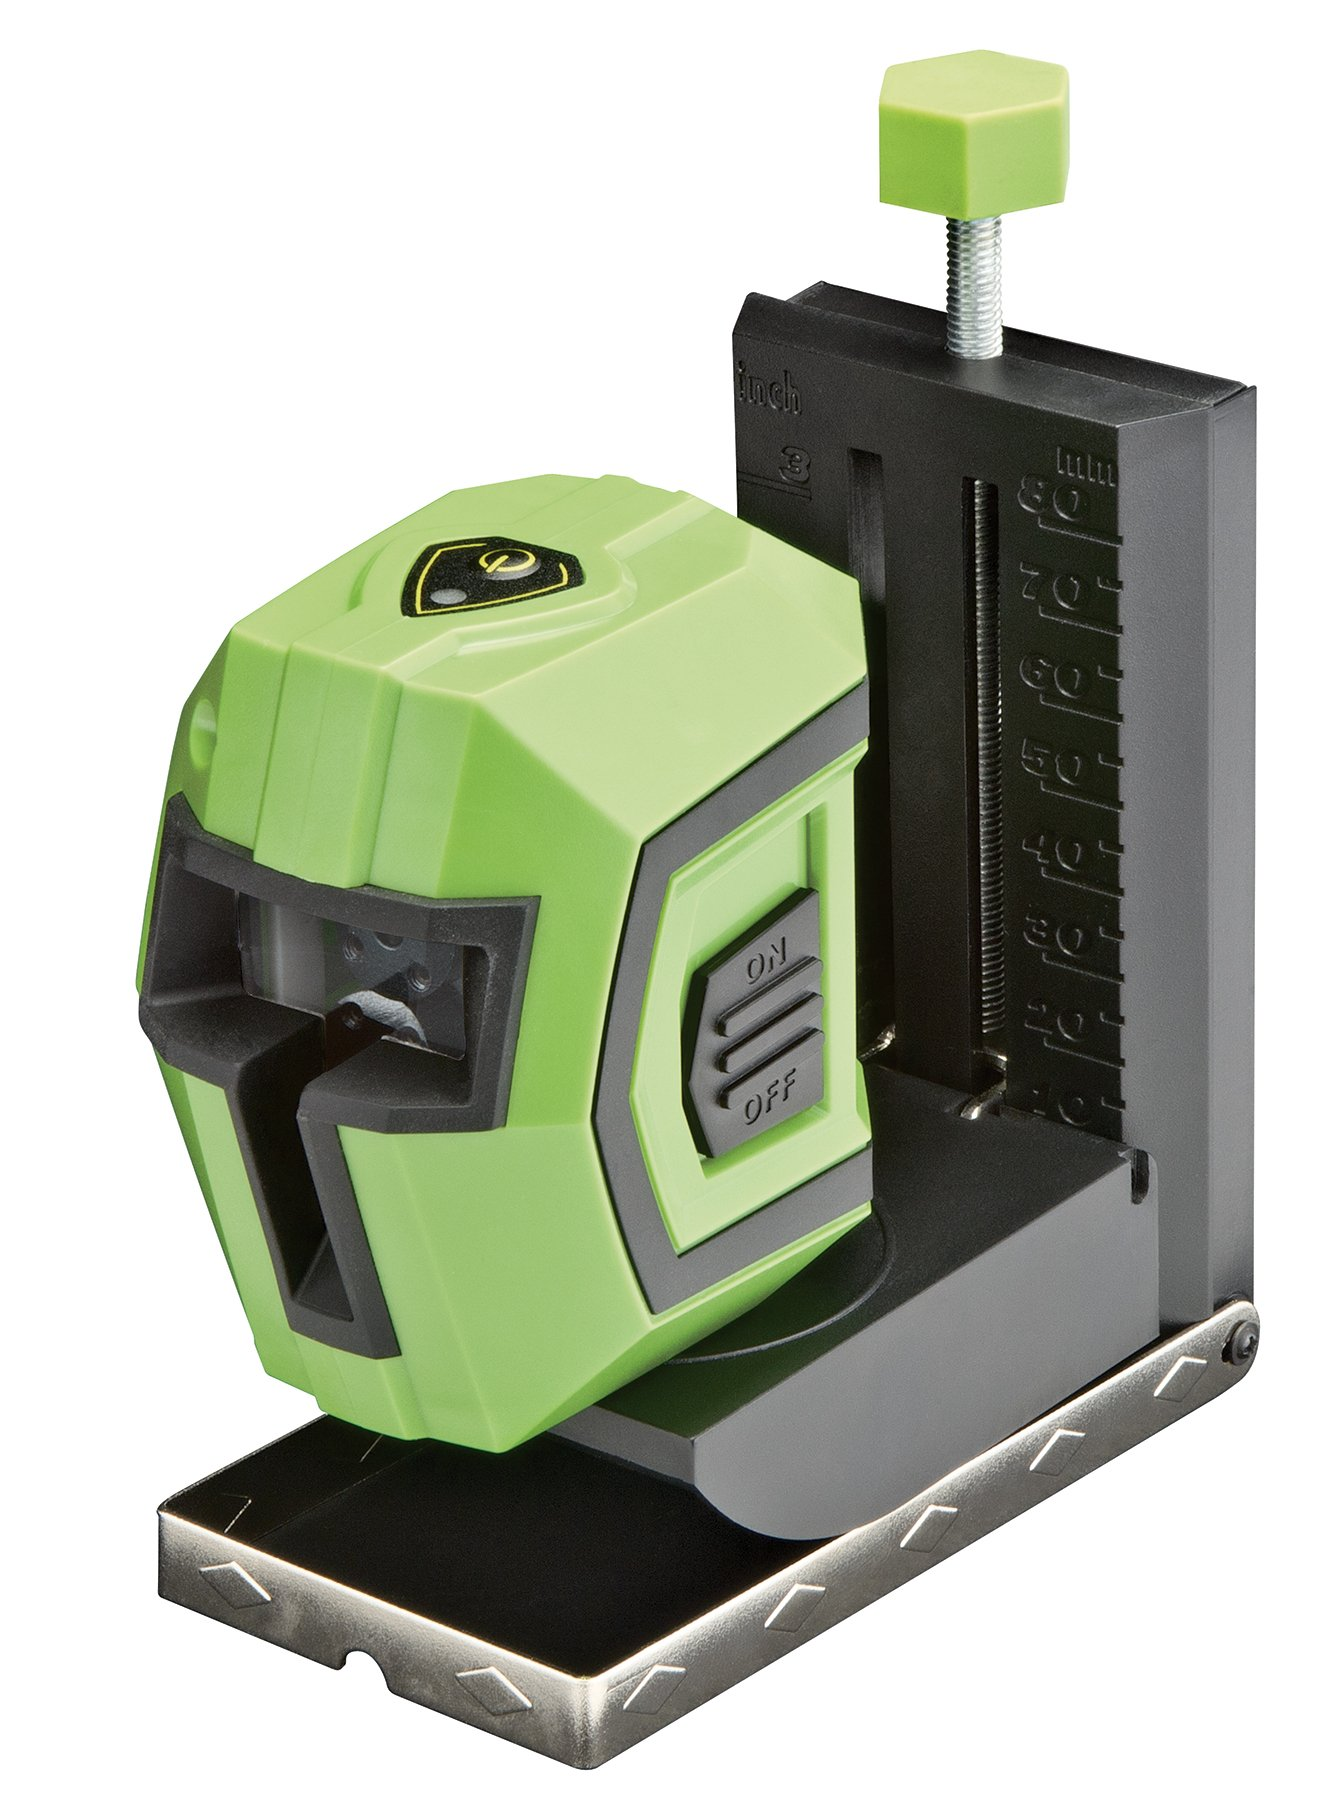 PowerSmith PLCL10BC Self-Leveling Cross-Line Laser Level